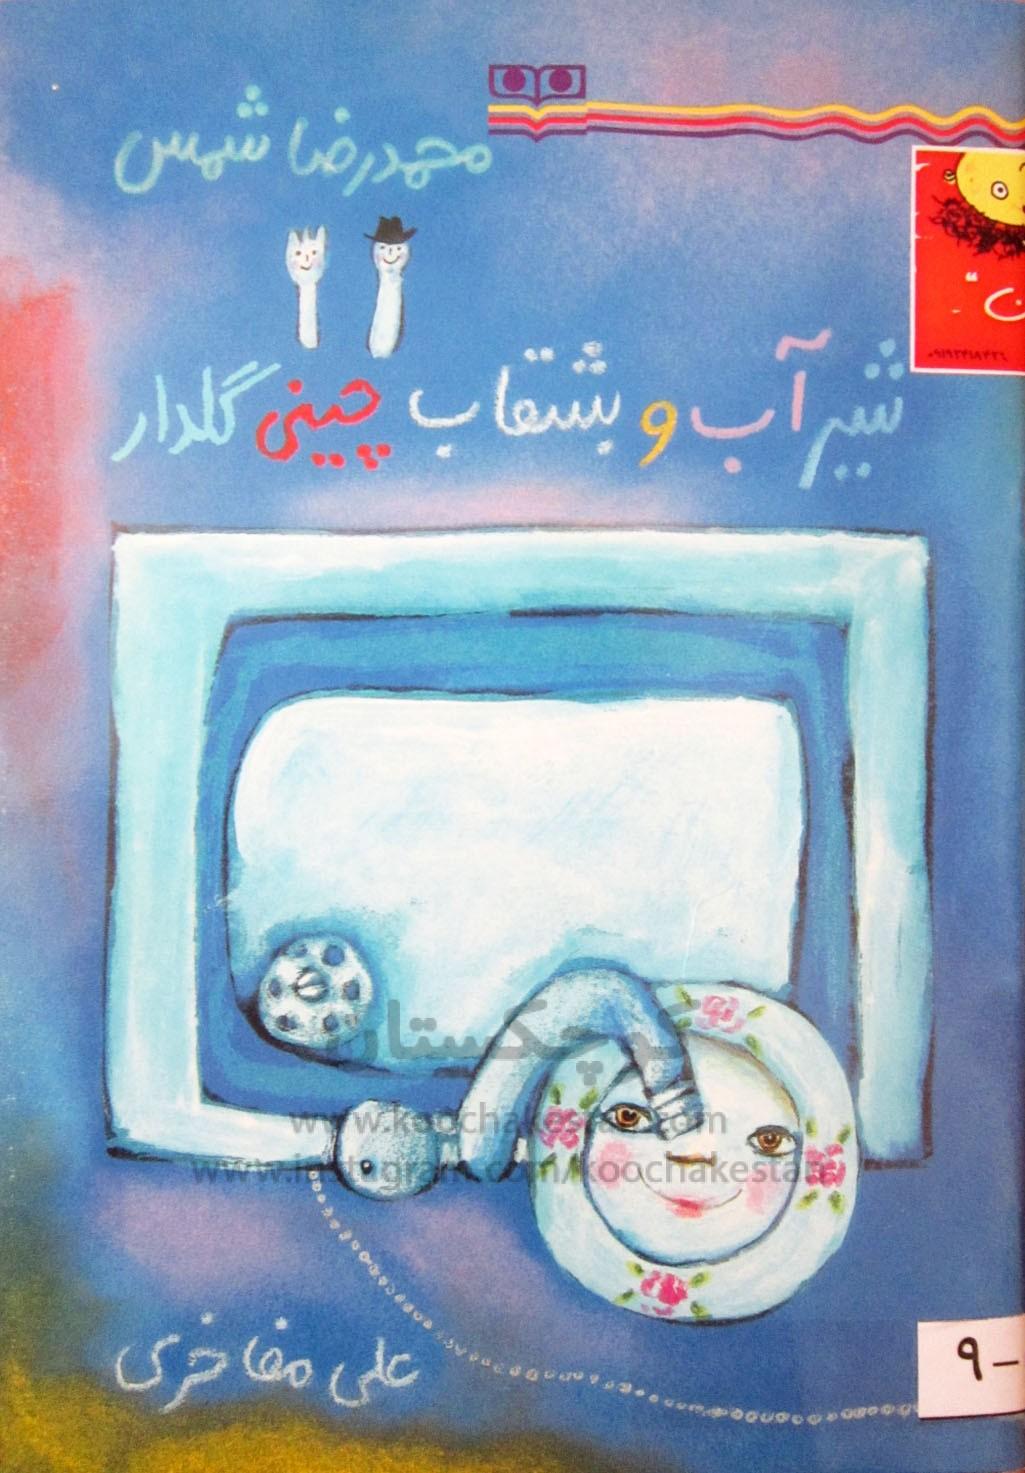 شیر آب و بشقاب چینی گلدار - کتابخانه کودک - کوچکستان